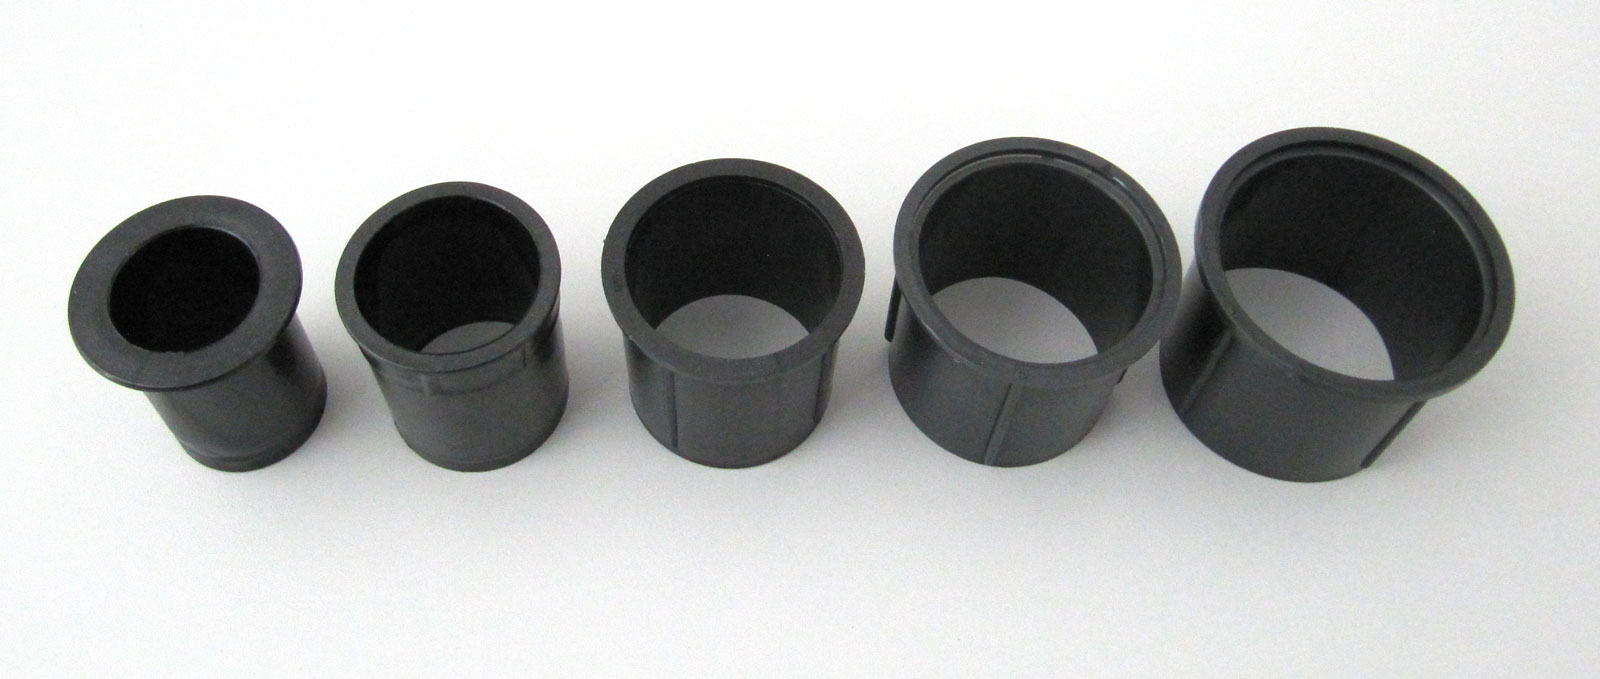 Aluminiumrohr Set 5-fach Adapter für Schirmstöcke Ø 26 - 56 mm grau Bild 2